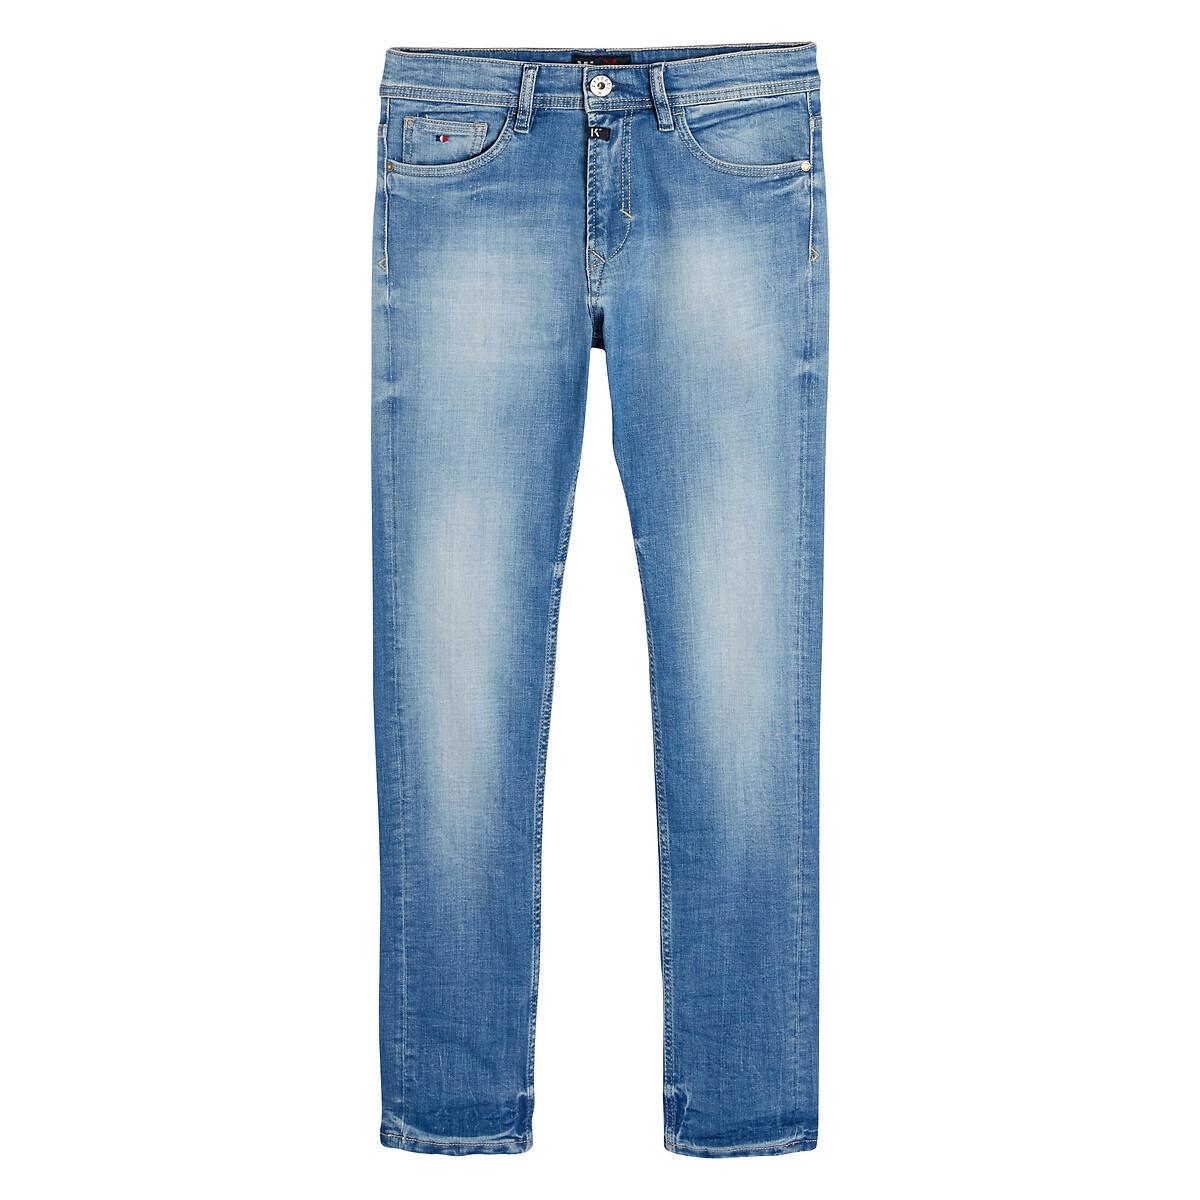 Джинсы La Redoute Узкого покроя стрейч Darko 28/34 синий джинсы la redoute стретч узкого покроя hatch 32 34 синий